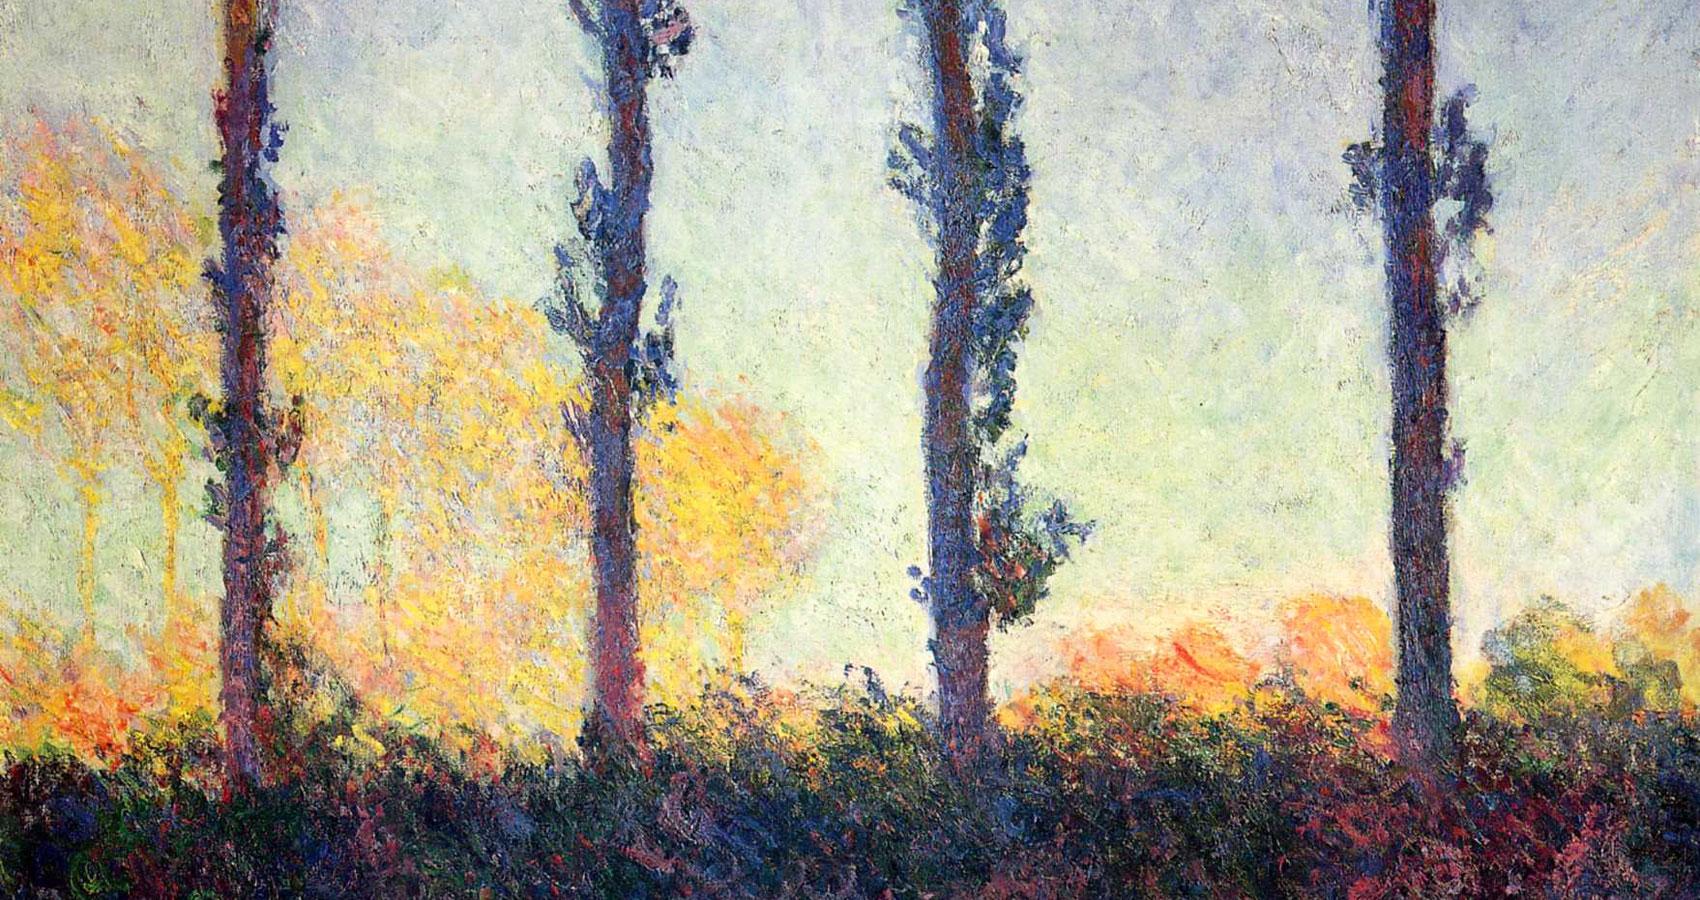 Eternal Blooms: In Defense of Poplars, written by Dr Santosh Bakaya at Spillwords.com